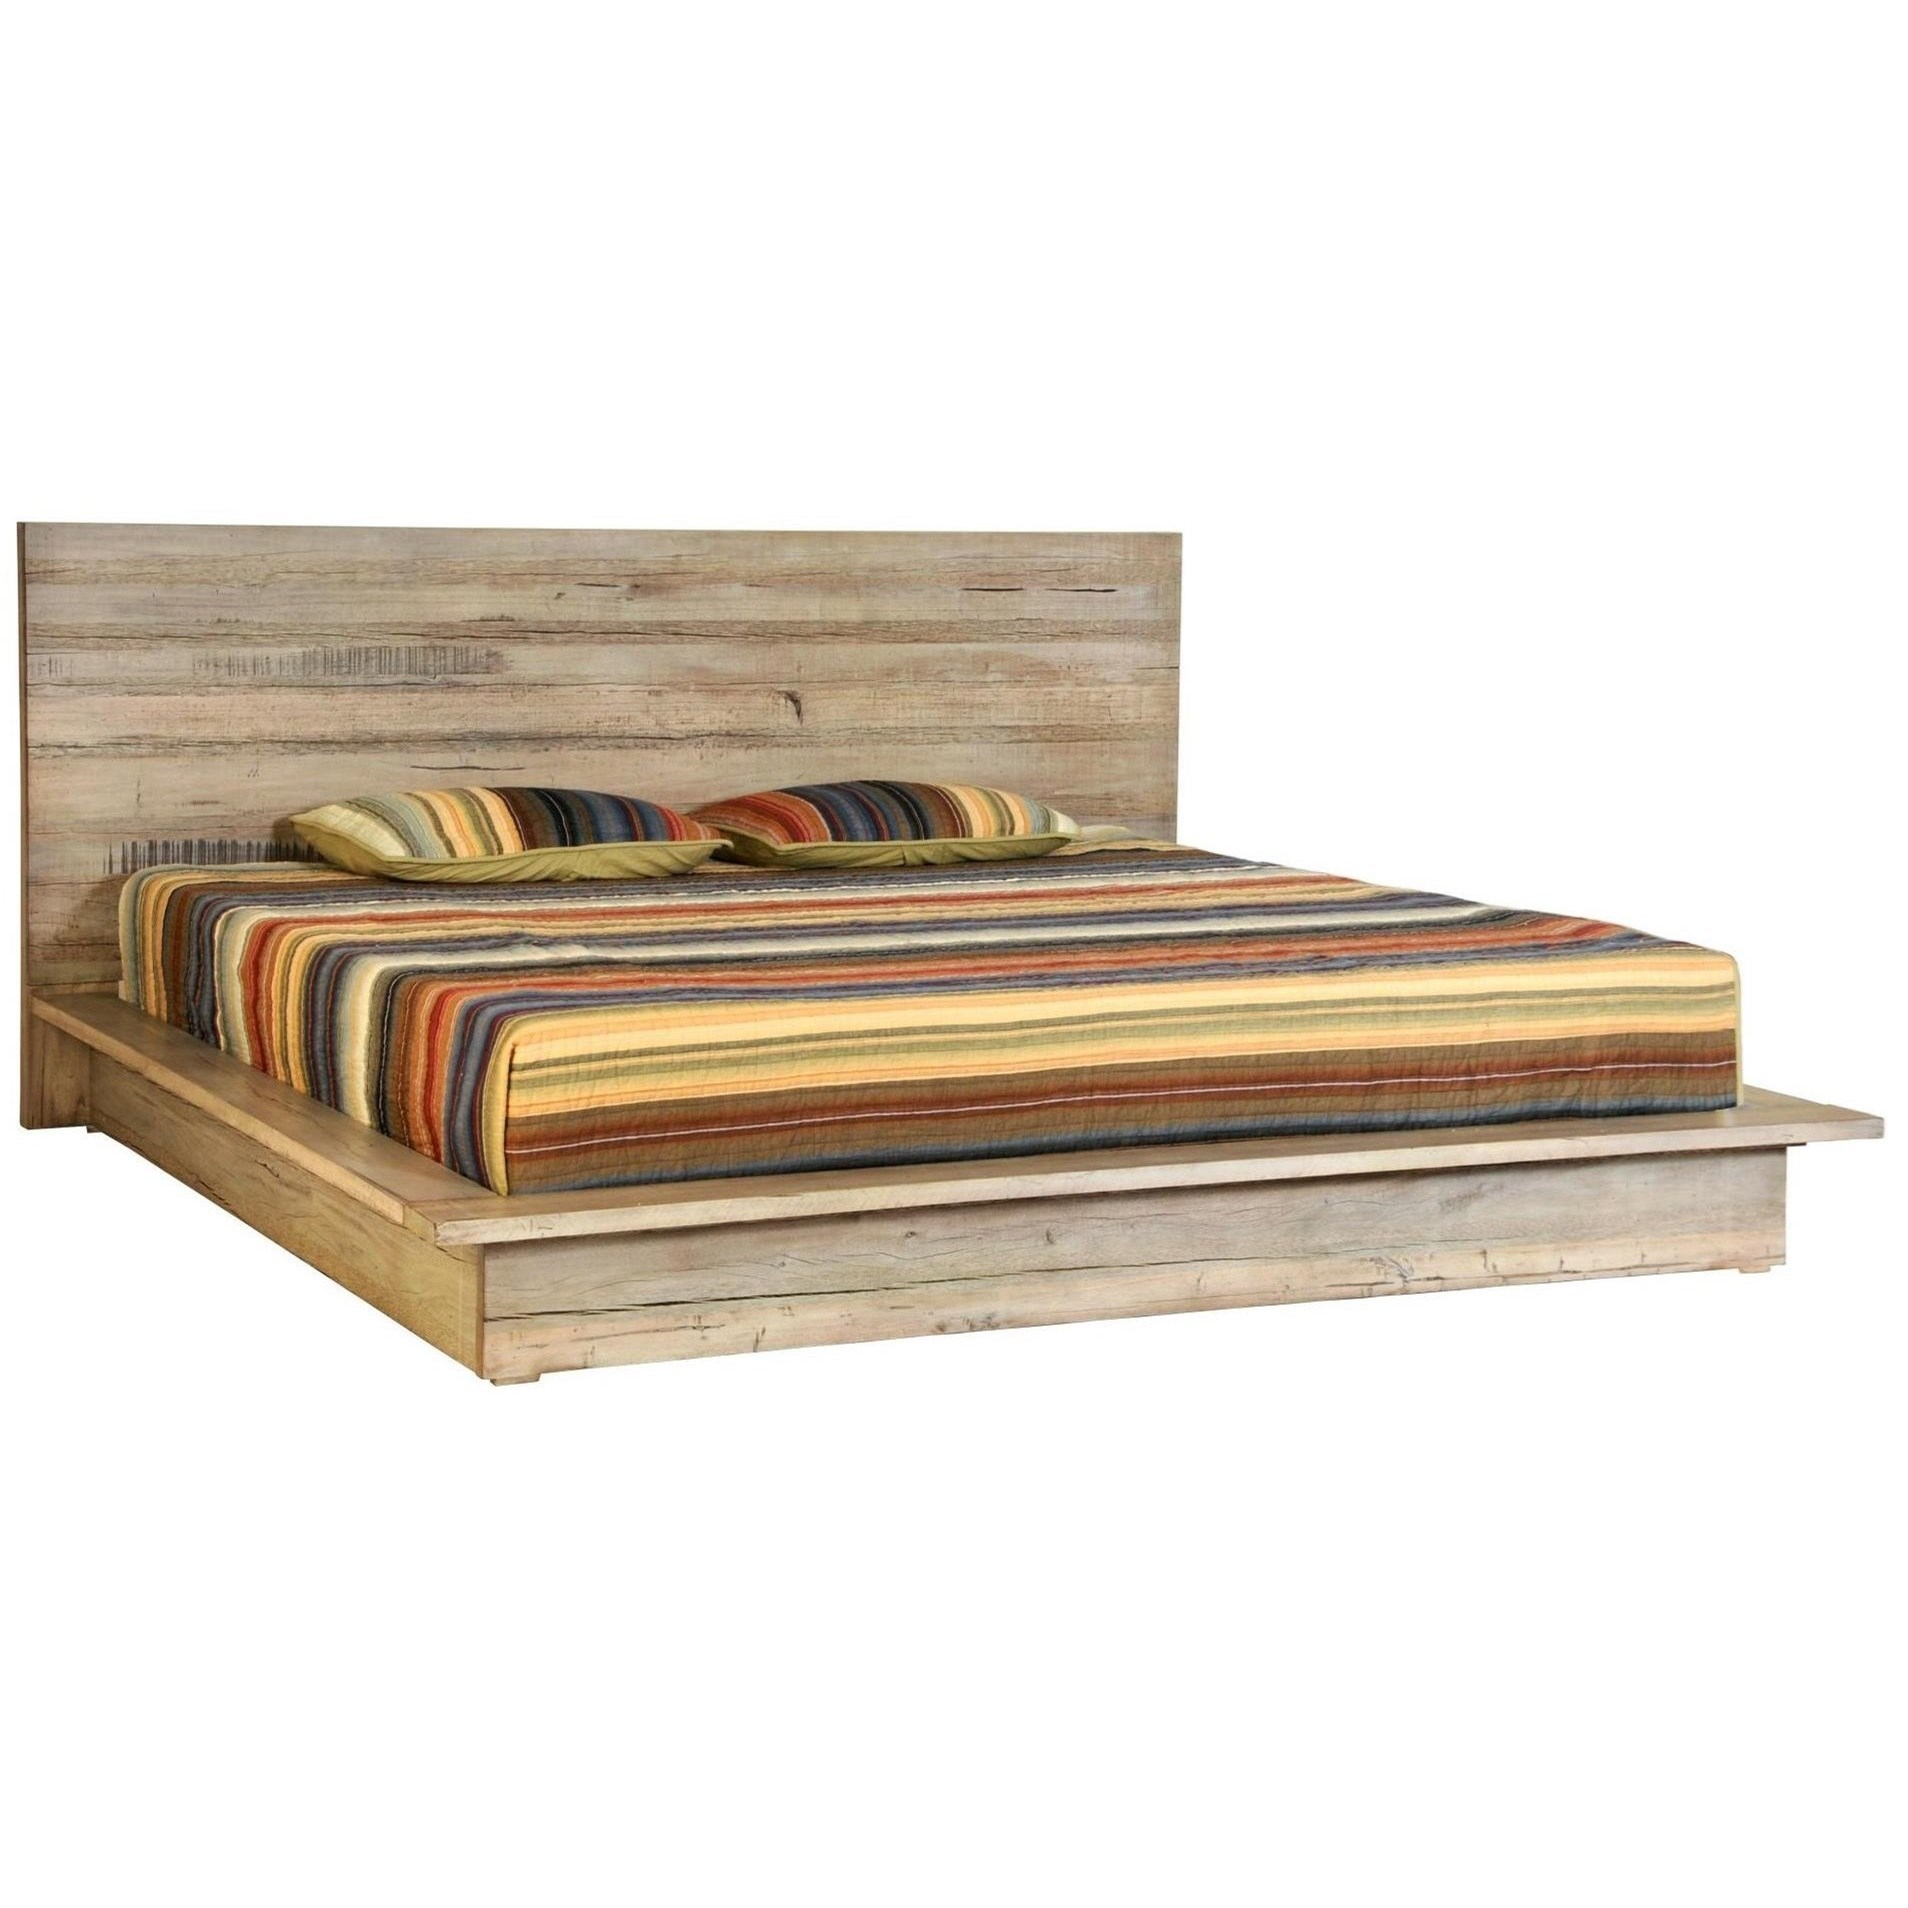 Renewal King Bed by Napa Furniture Designs at HomeWorld Furniture